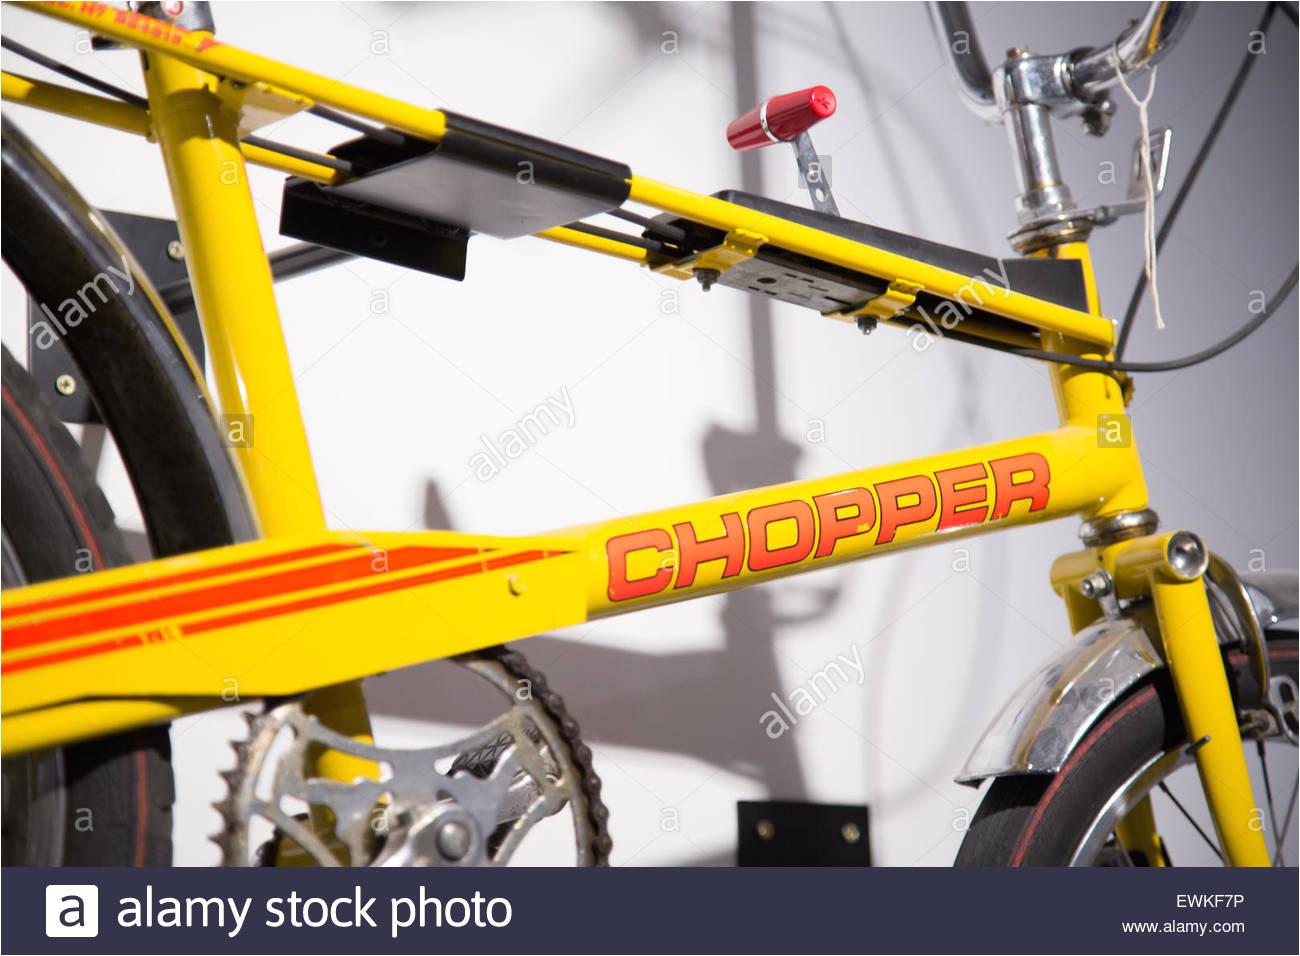 raleigh chopper fahrrad vintage retro fahrrad an der coventry transport museum stockbild